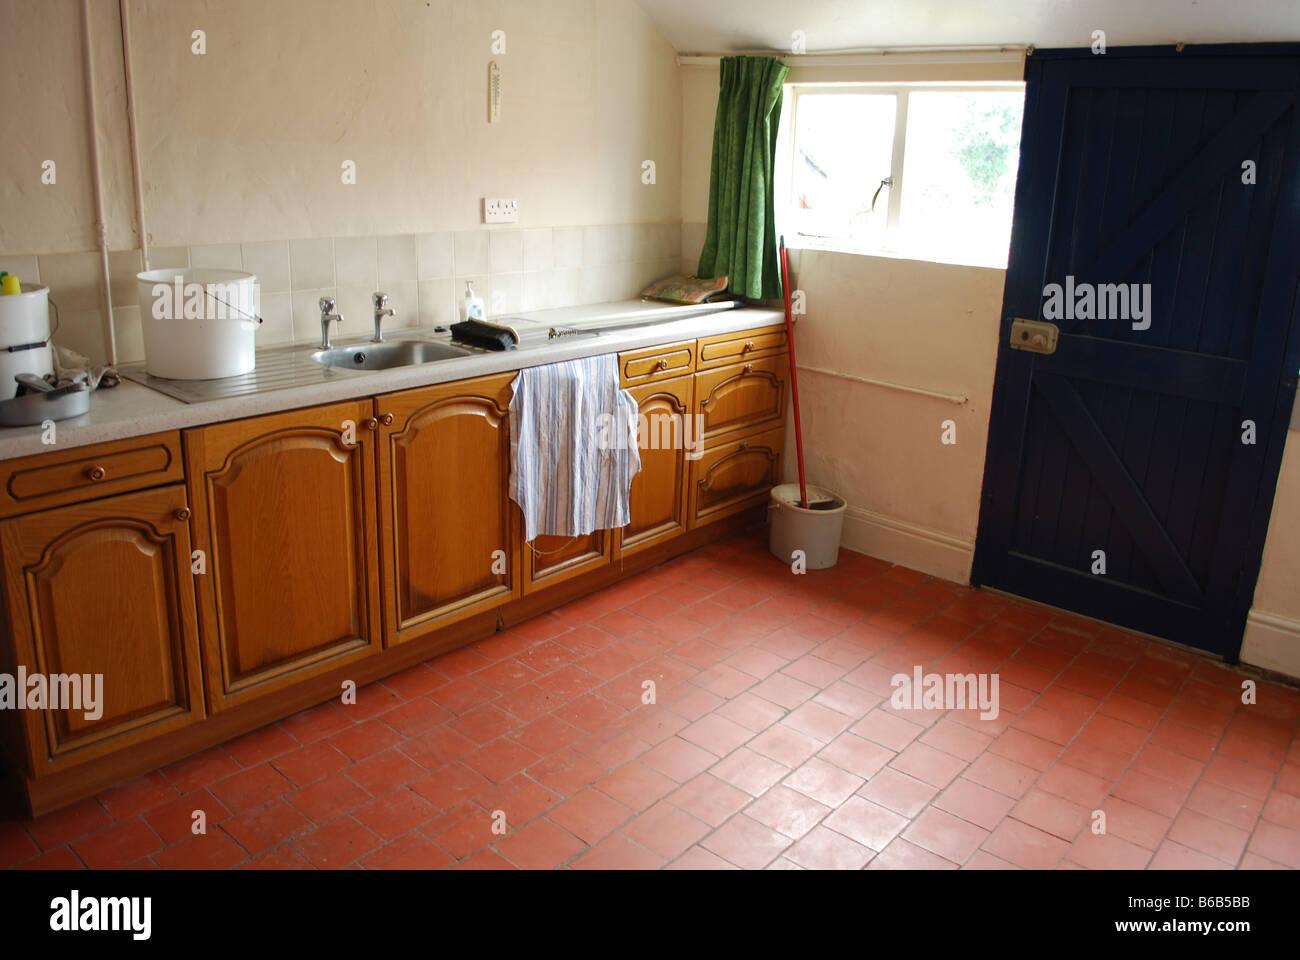 Kitchen Unit Stockfotos & Kitchen Unit Bilder - Alamy